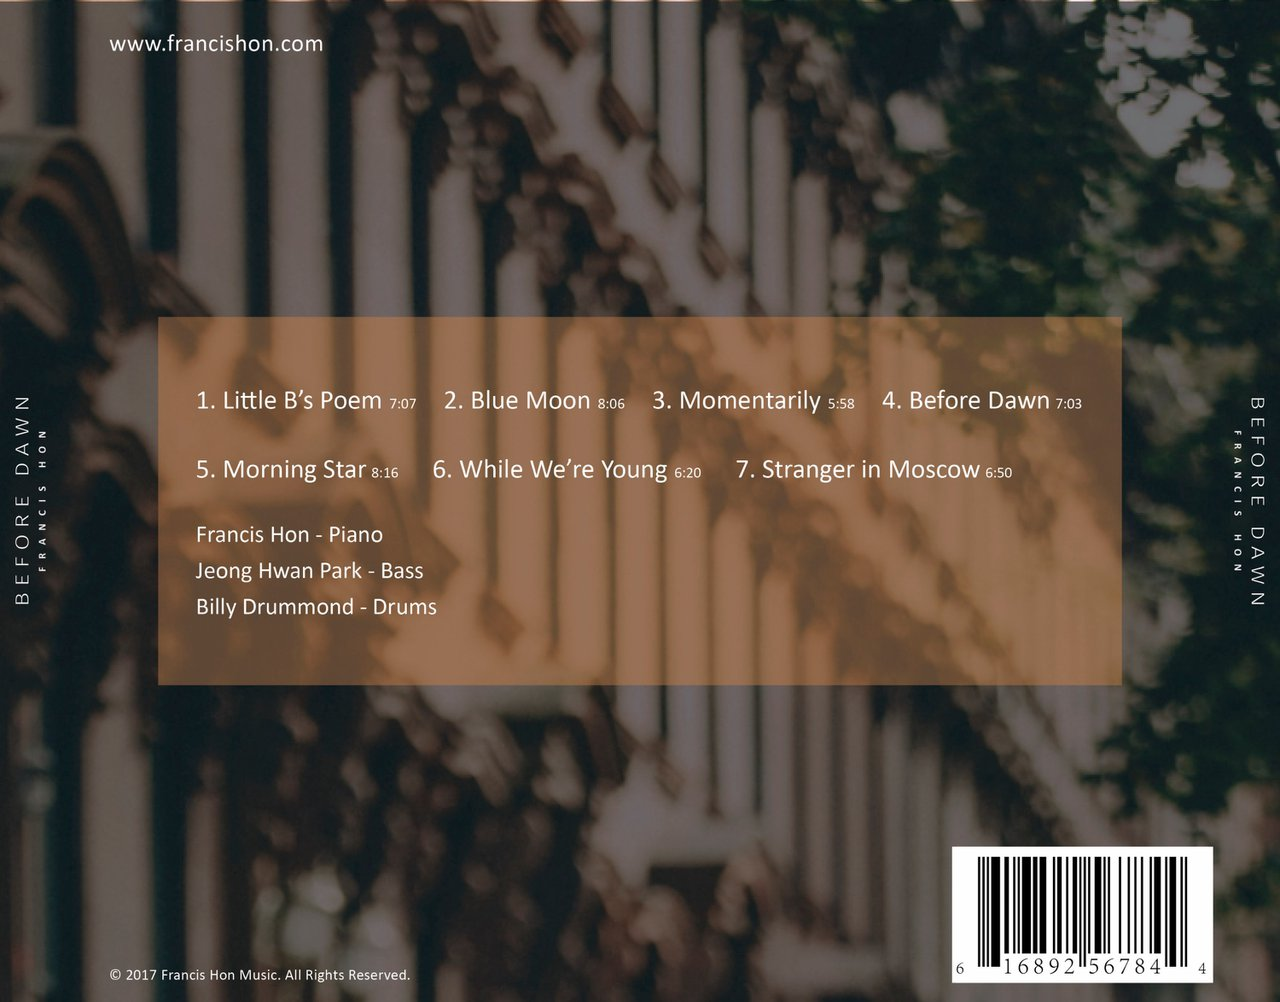 Before Dawn - Jazz Debut Album photo Before Dawn Back.jpg